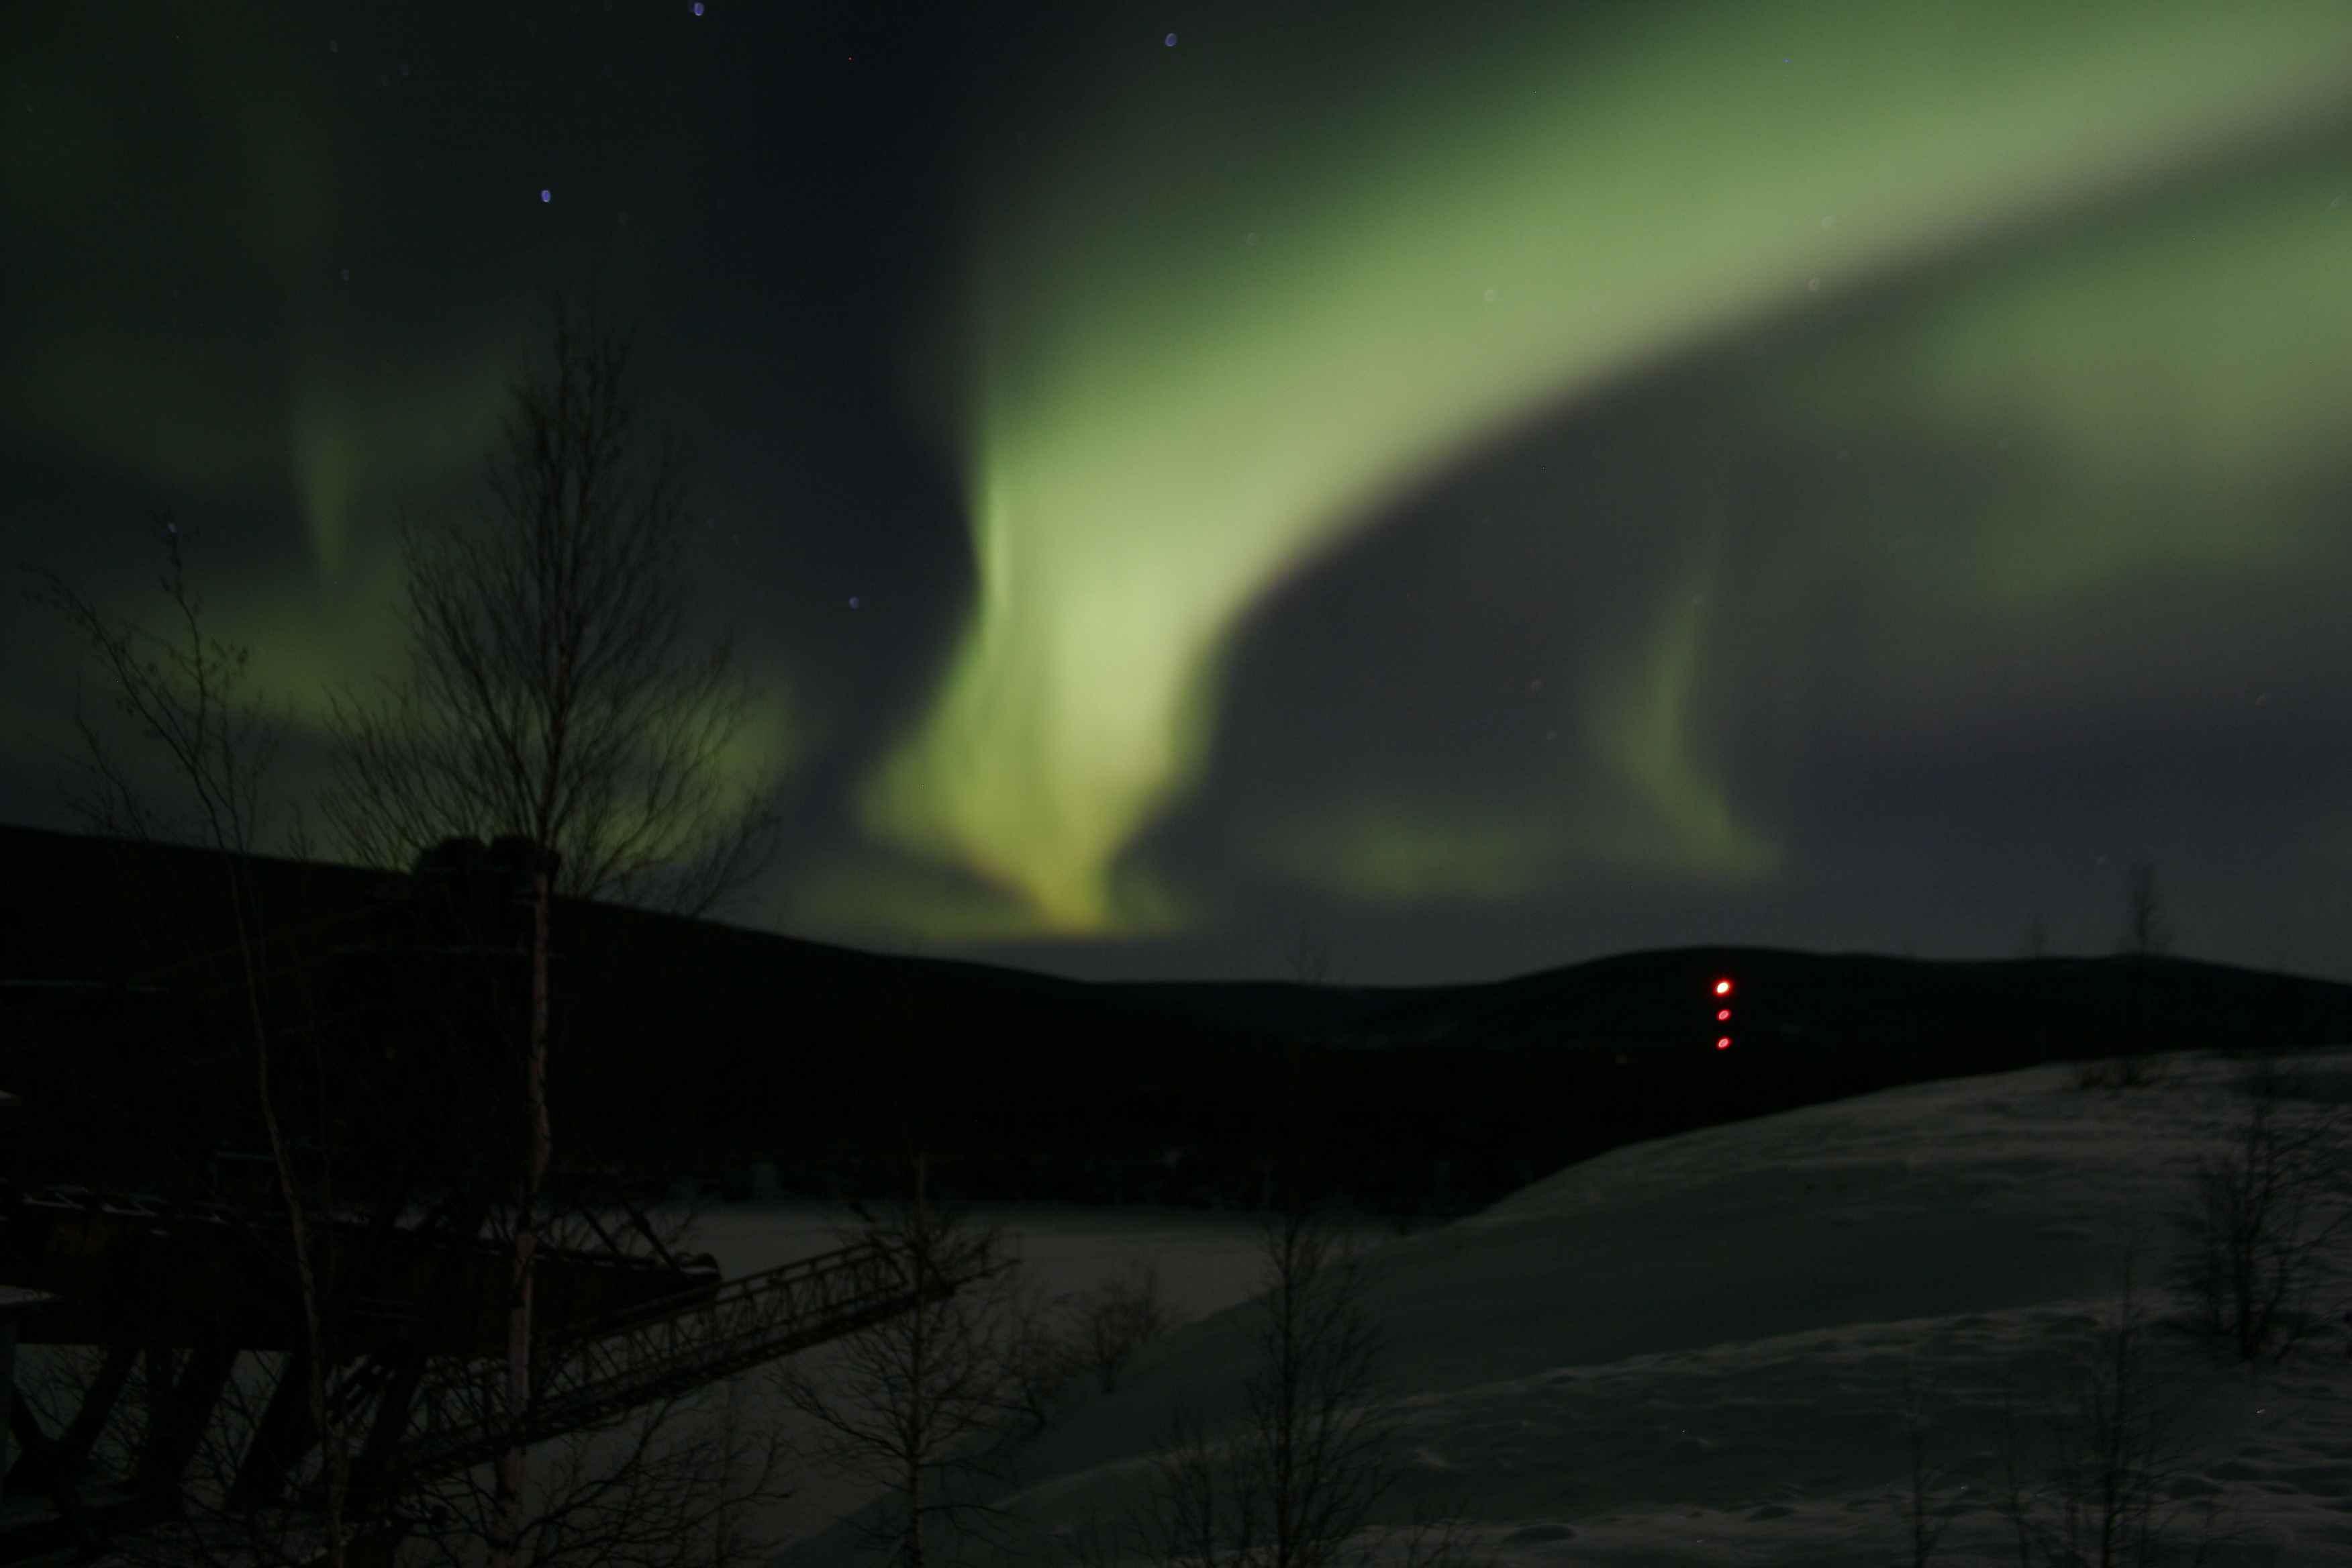 Fall And Winter Wallpaper Free Picture Northern Lights Alaska Aurora Borealis